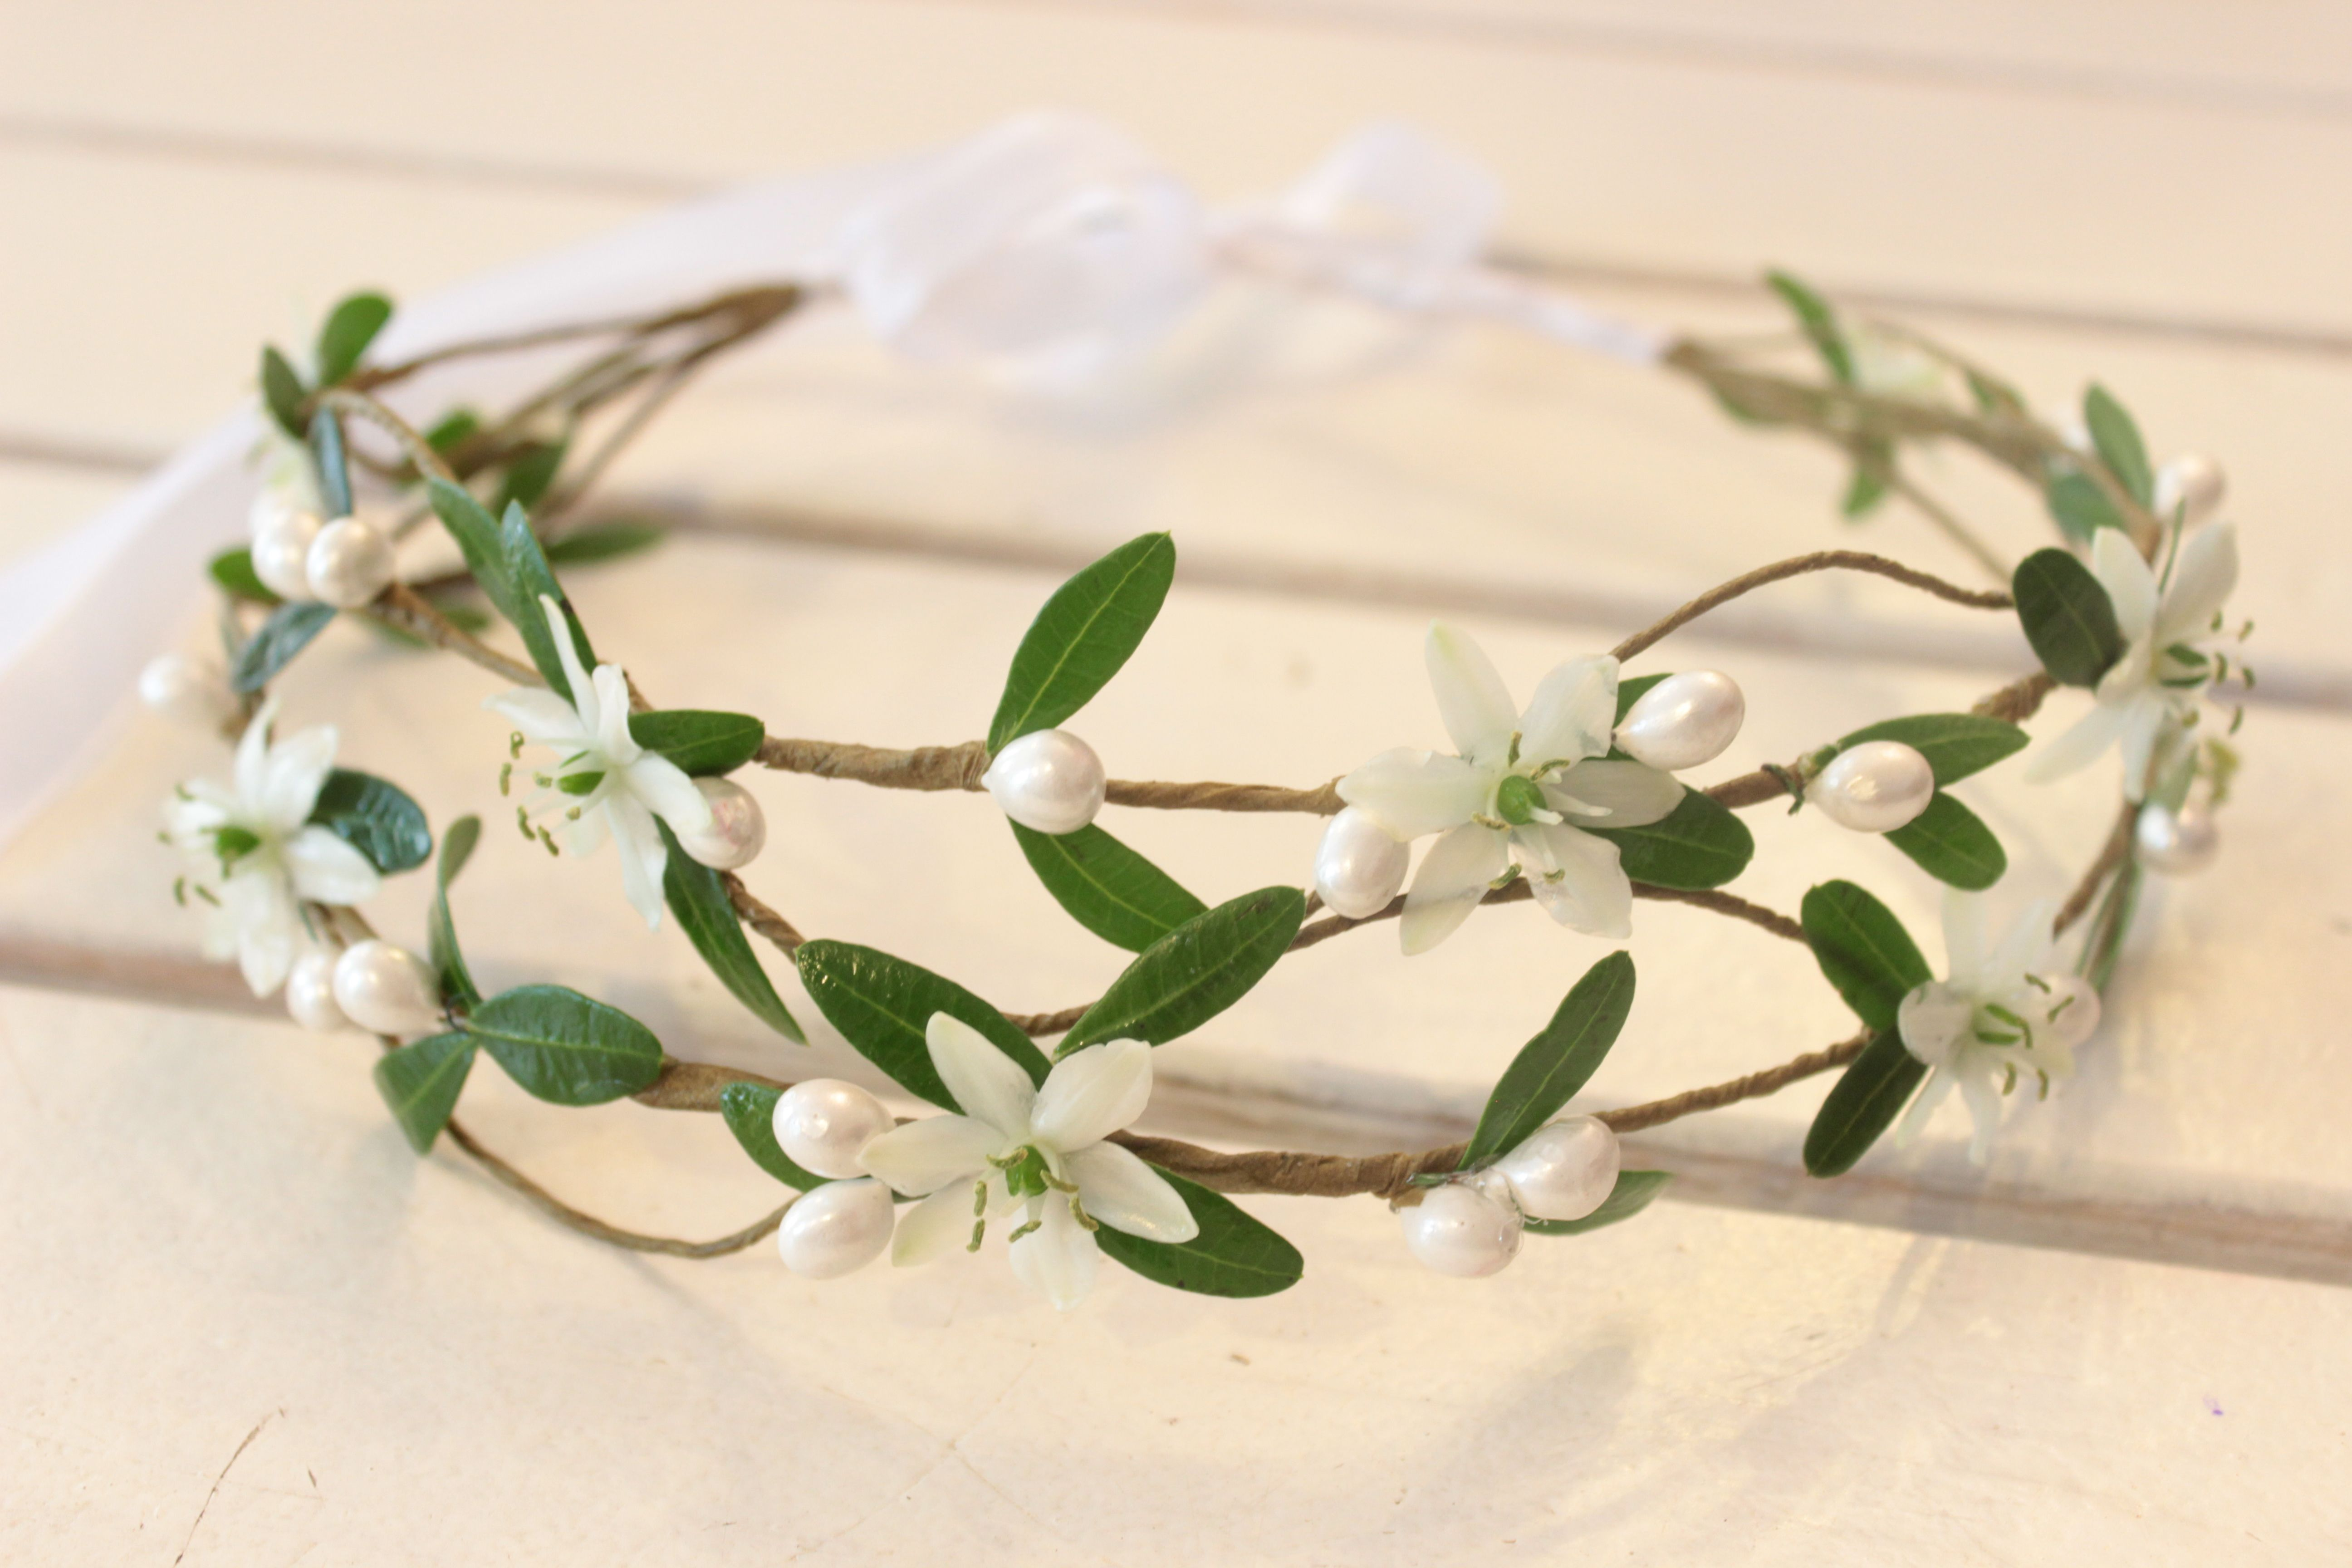 Wianek Slubny Komunia Wieczor Panienski Wedding Floral Floral Design